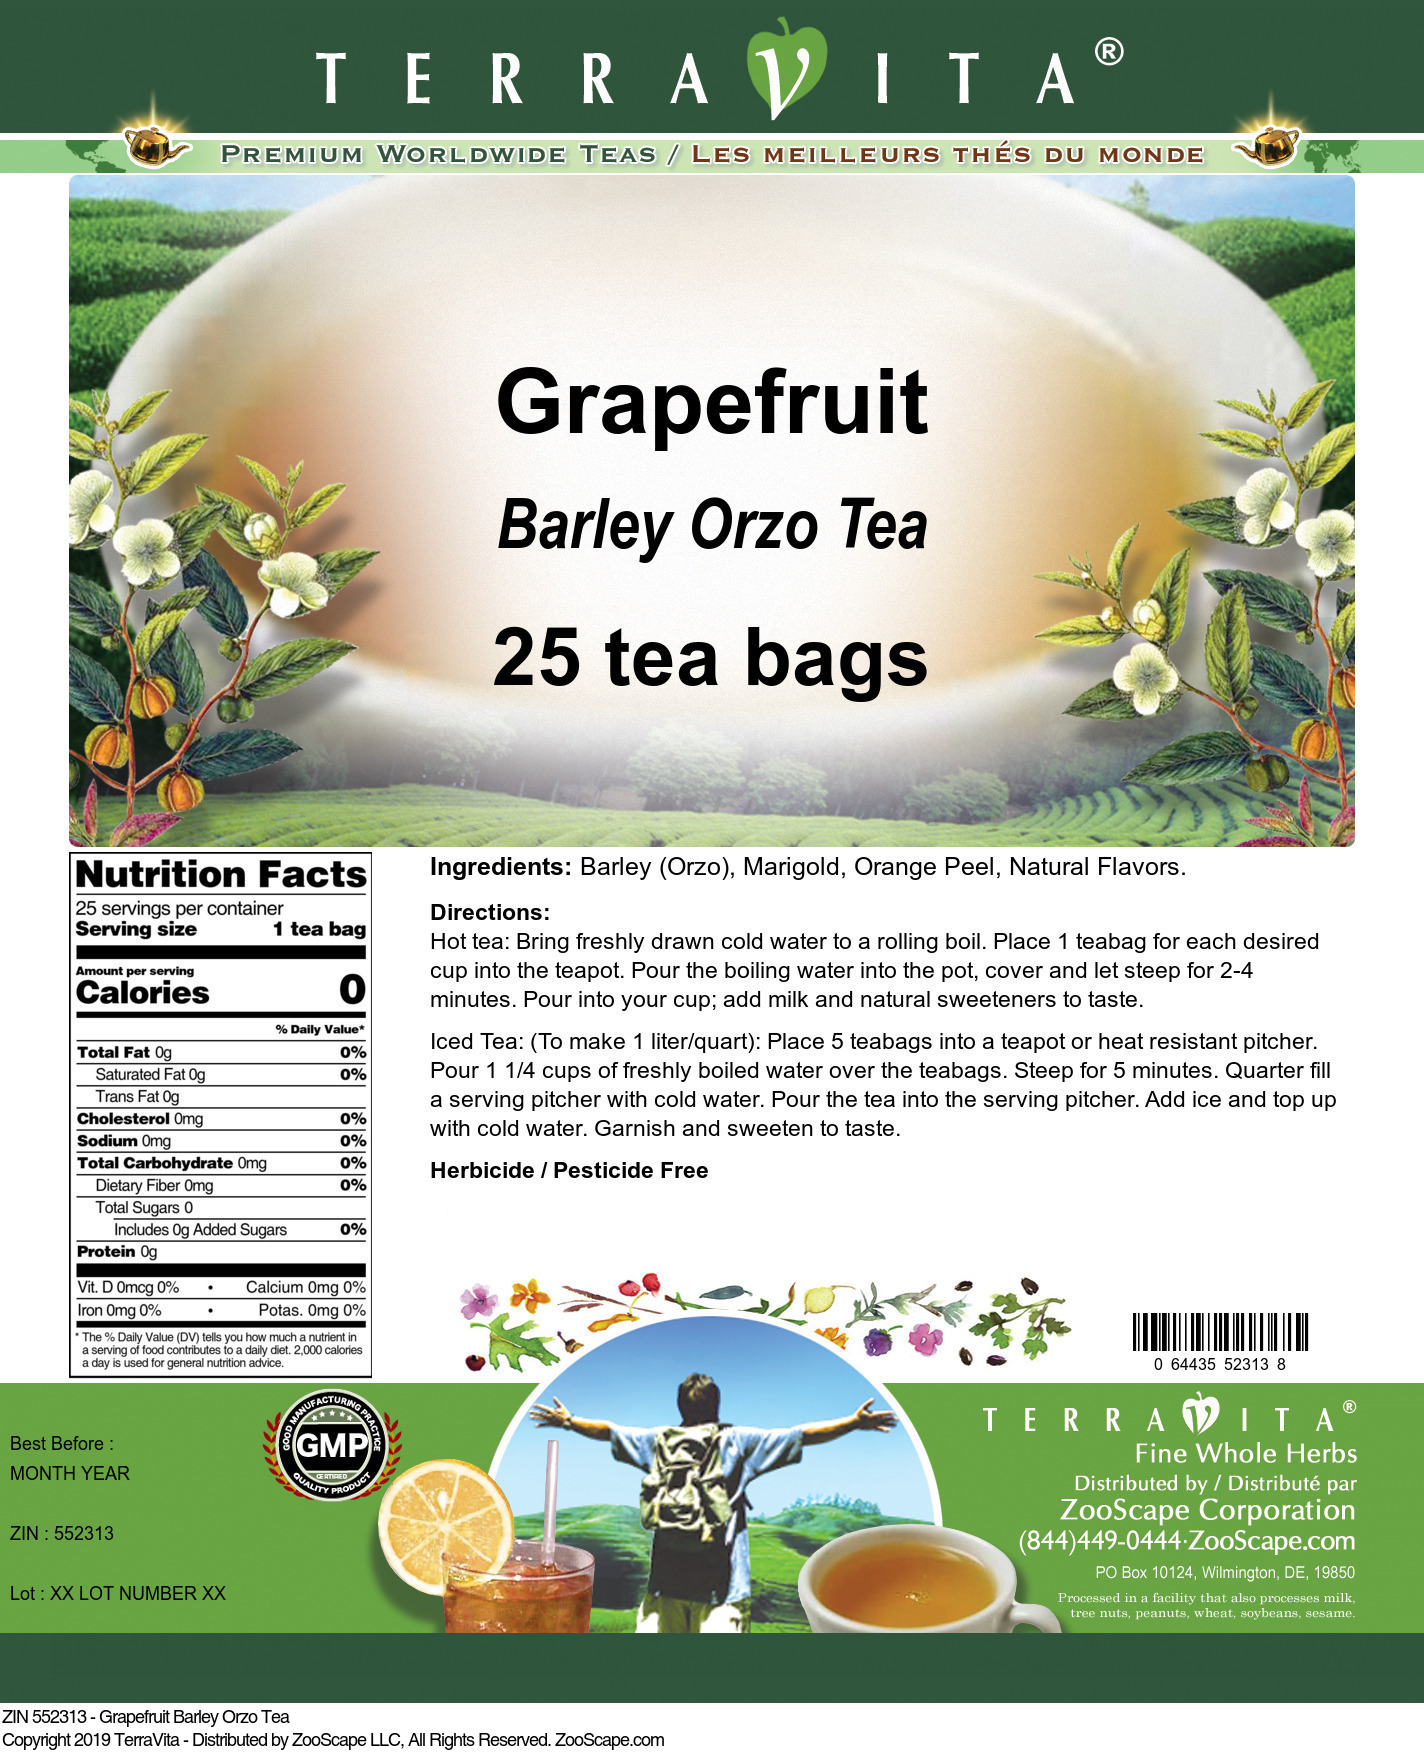 Grapefruit Barley Orzo